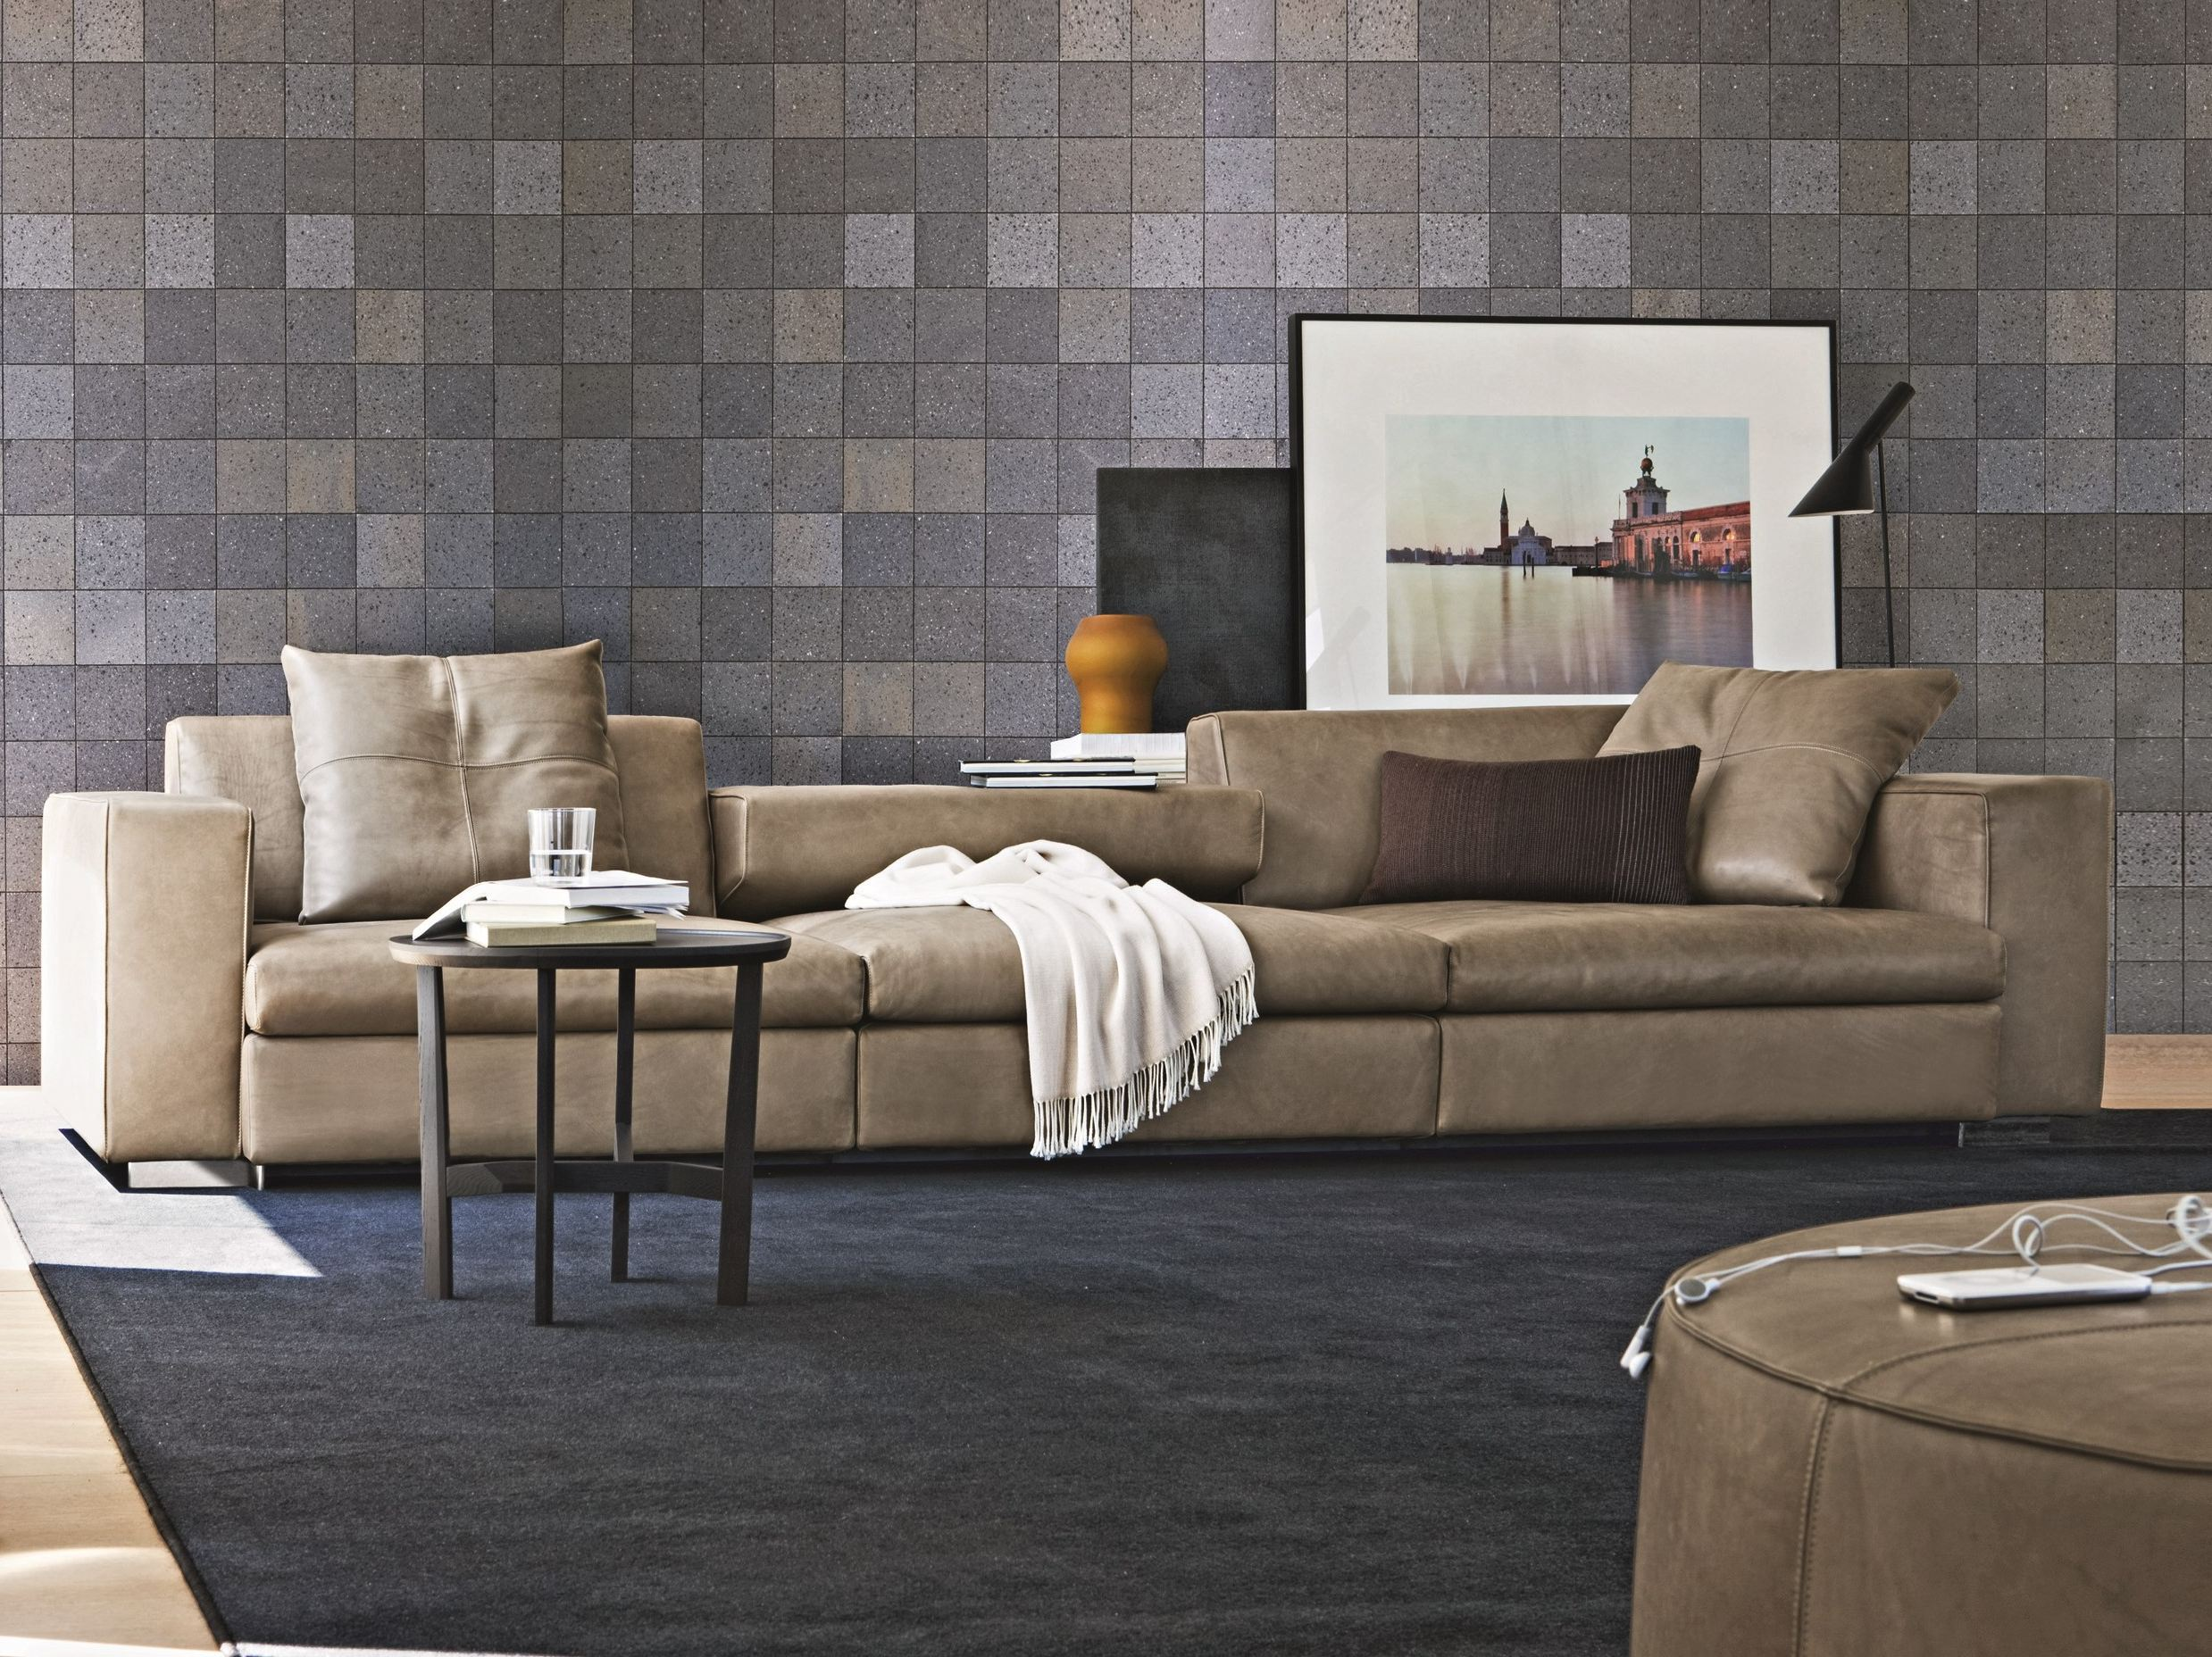 TURNER Leather sofa by MOLTENI & C. design Hannes Wettstein